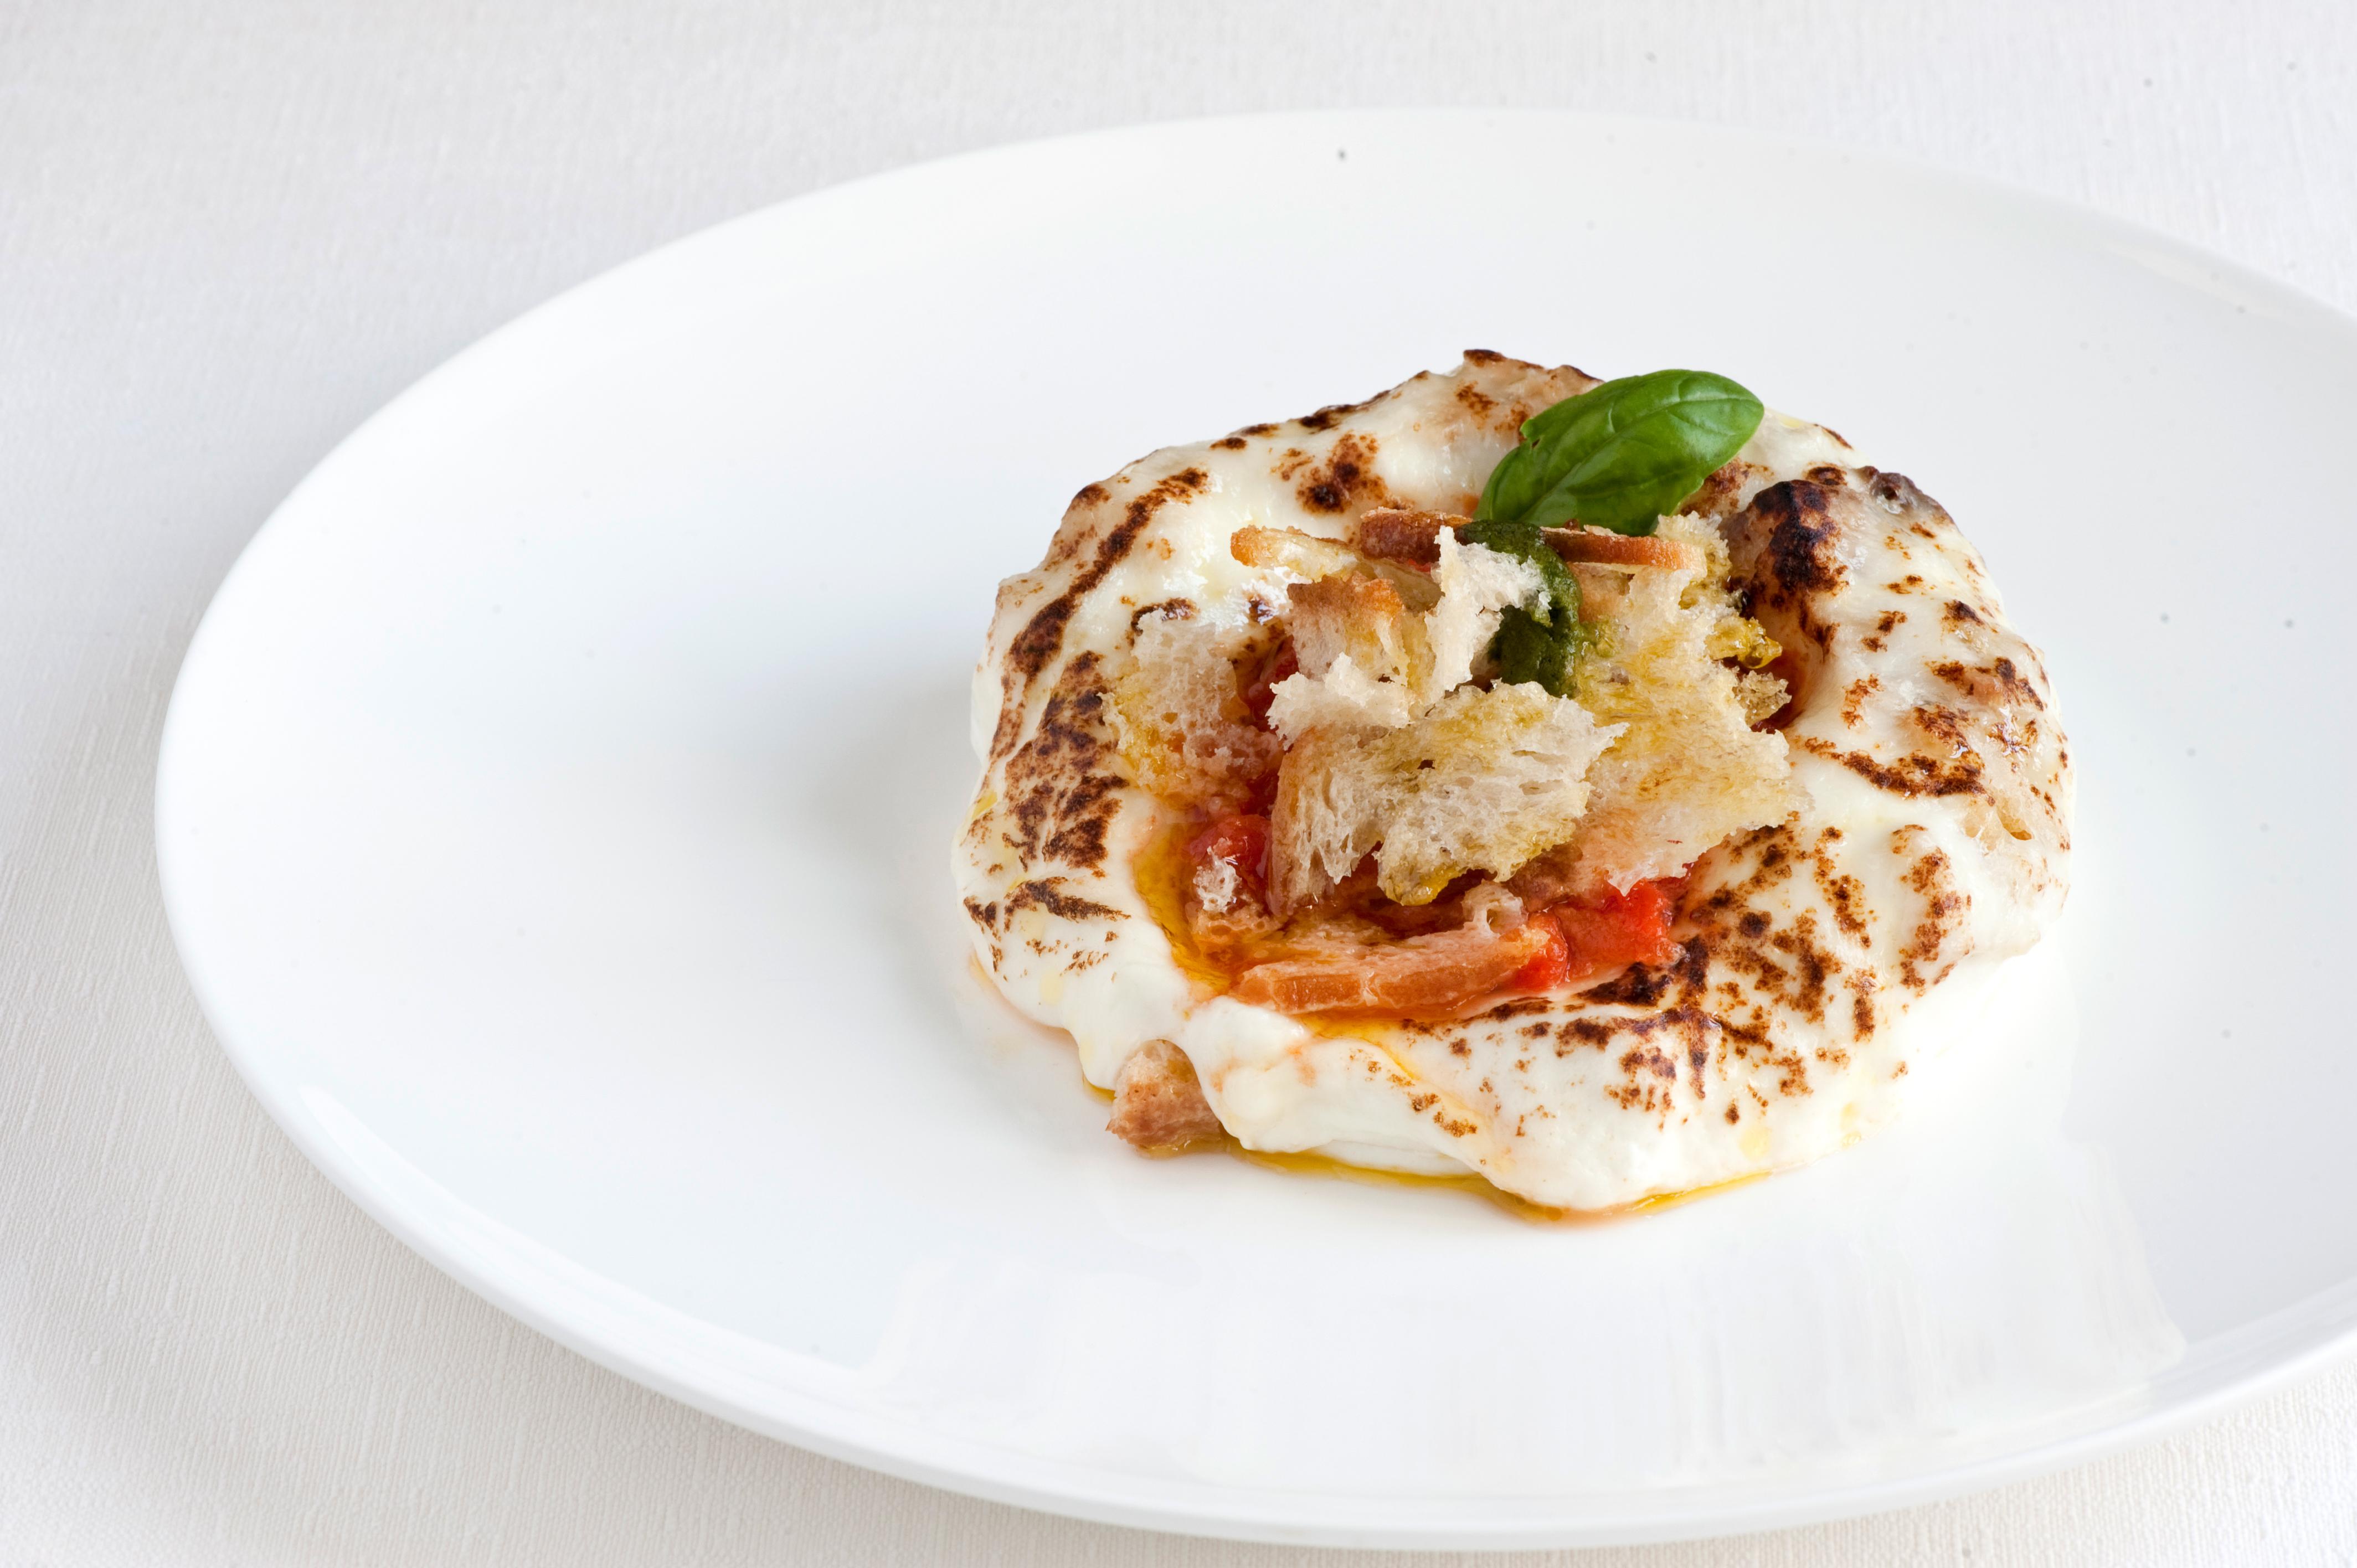 Pizza Recipes - Great Italian Chefs